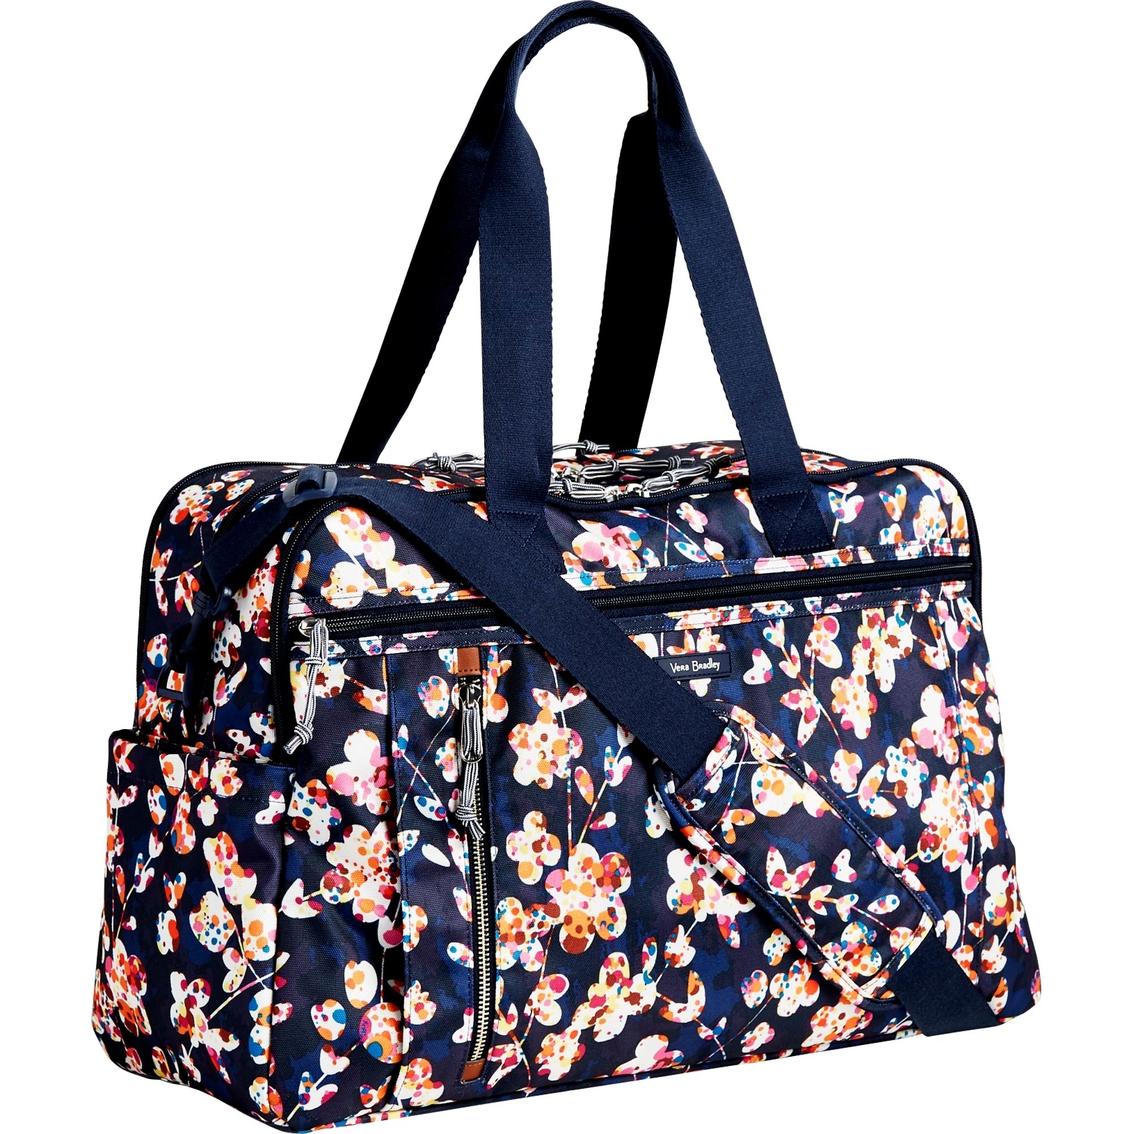 39f472840 Vera Bradley Lighten Up Weekender Travel Bag, Cut Vines | Shop By ...